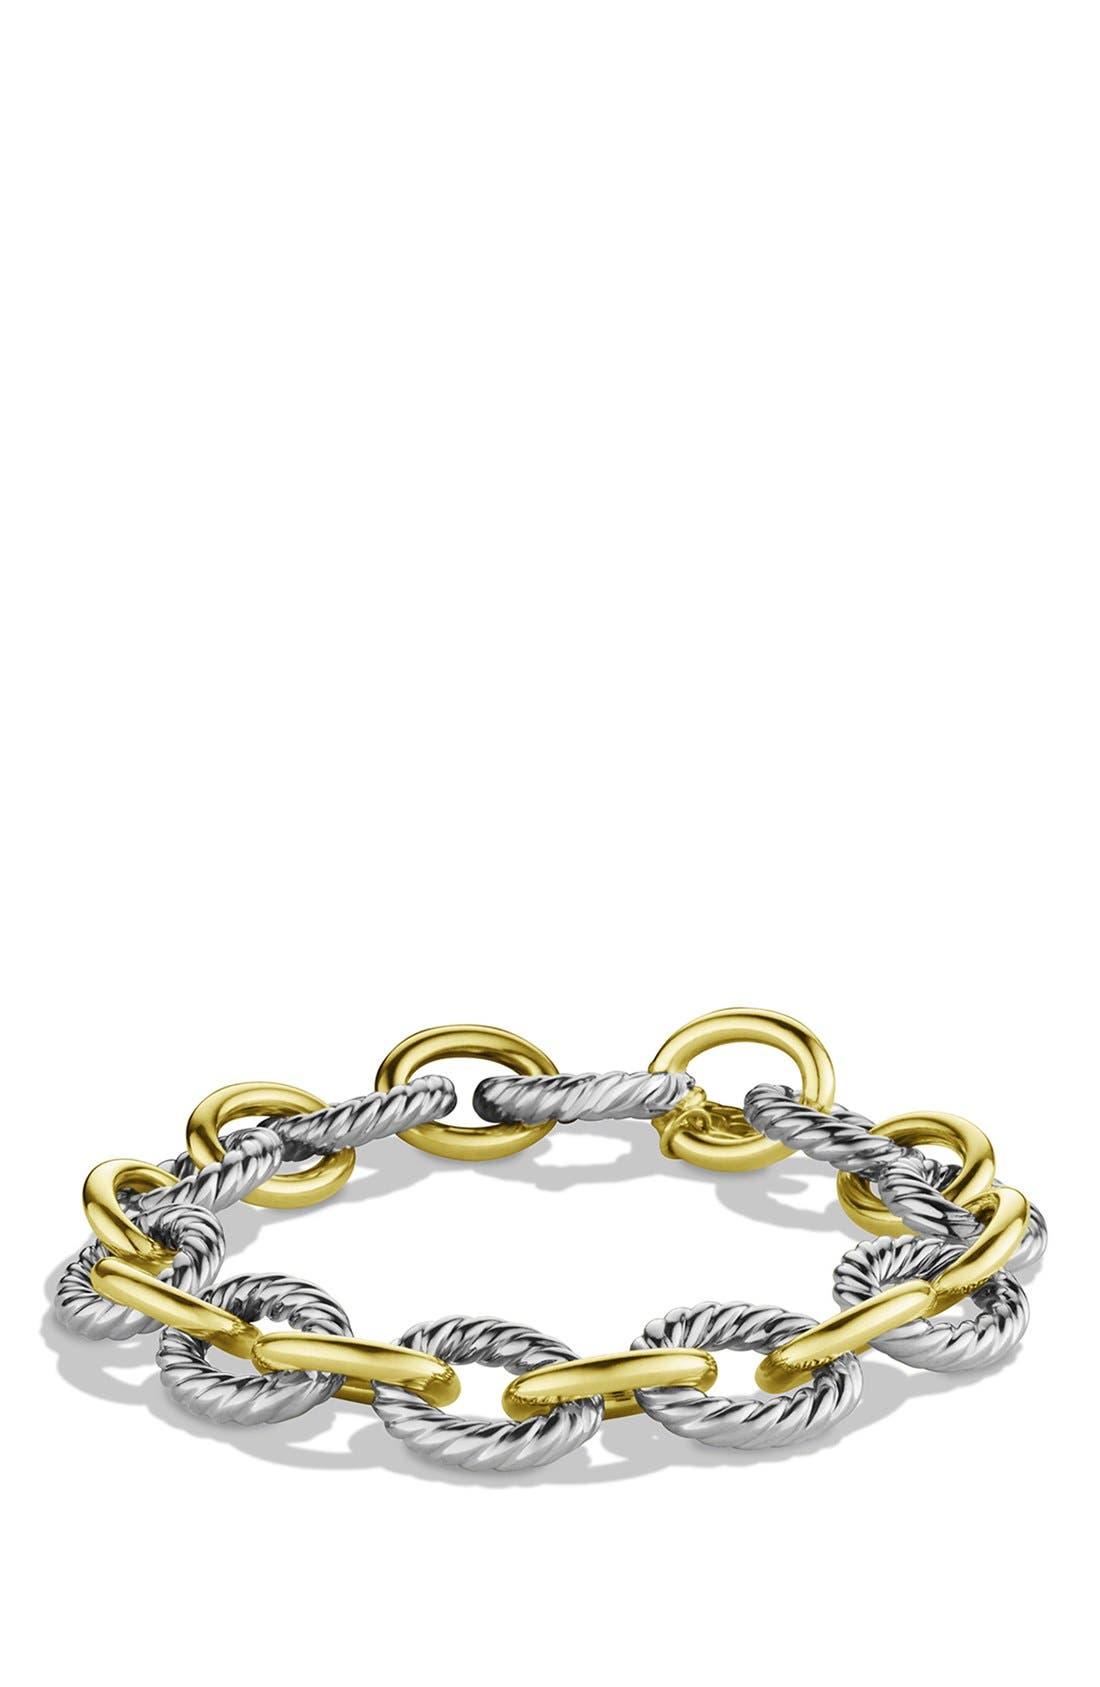 David Yurman 'Oval' Large Link Bracelet with Gold